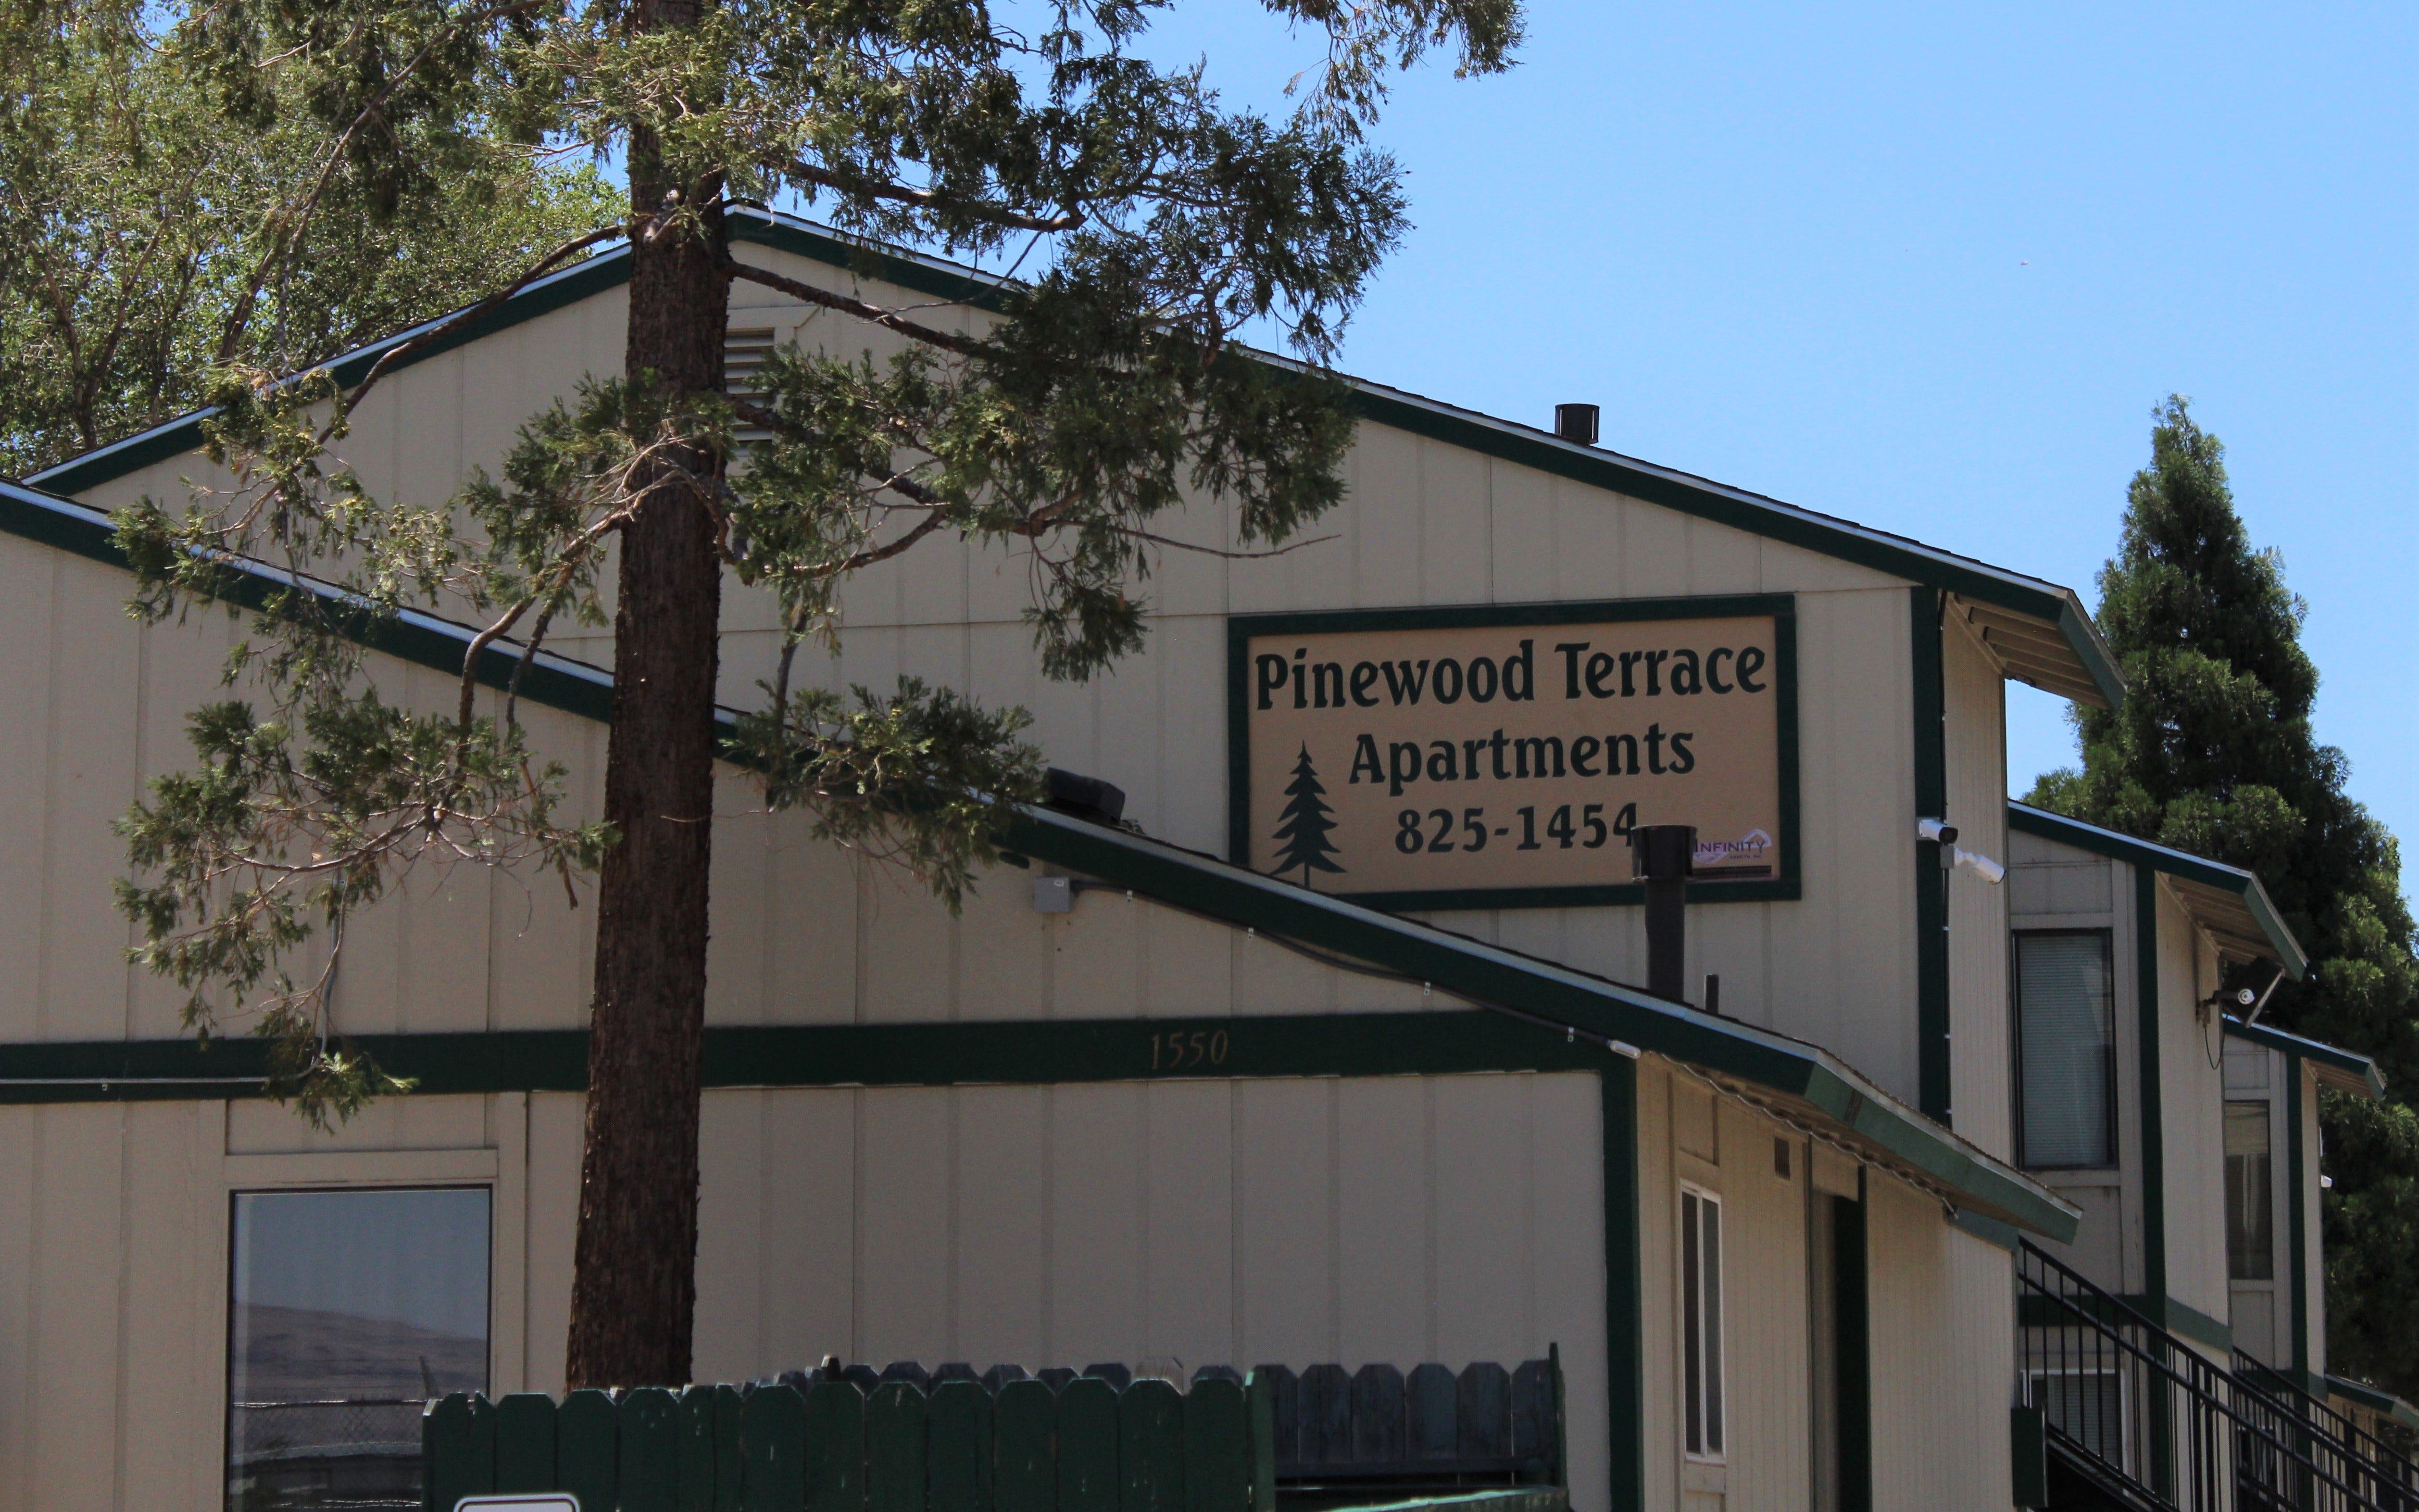 Pinewood Terrace Apartments in Reno. Photo taken July 21, 2021.